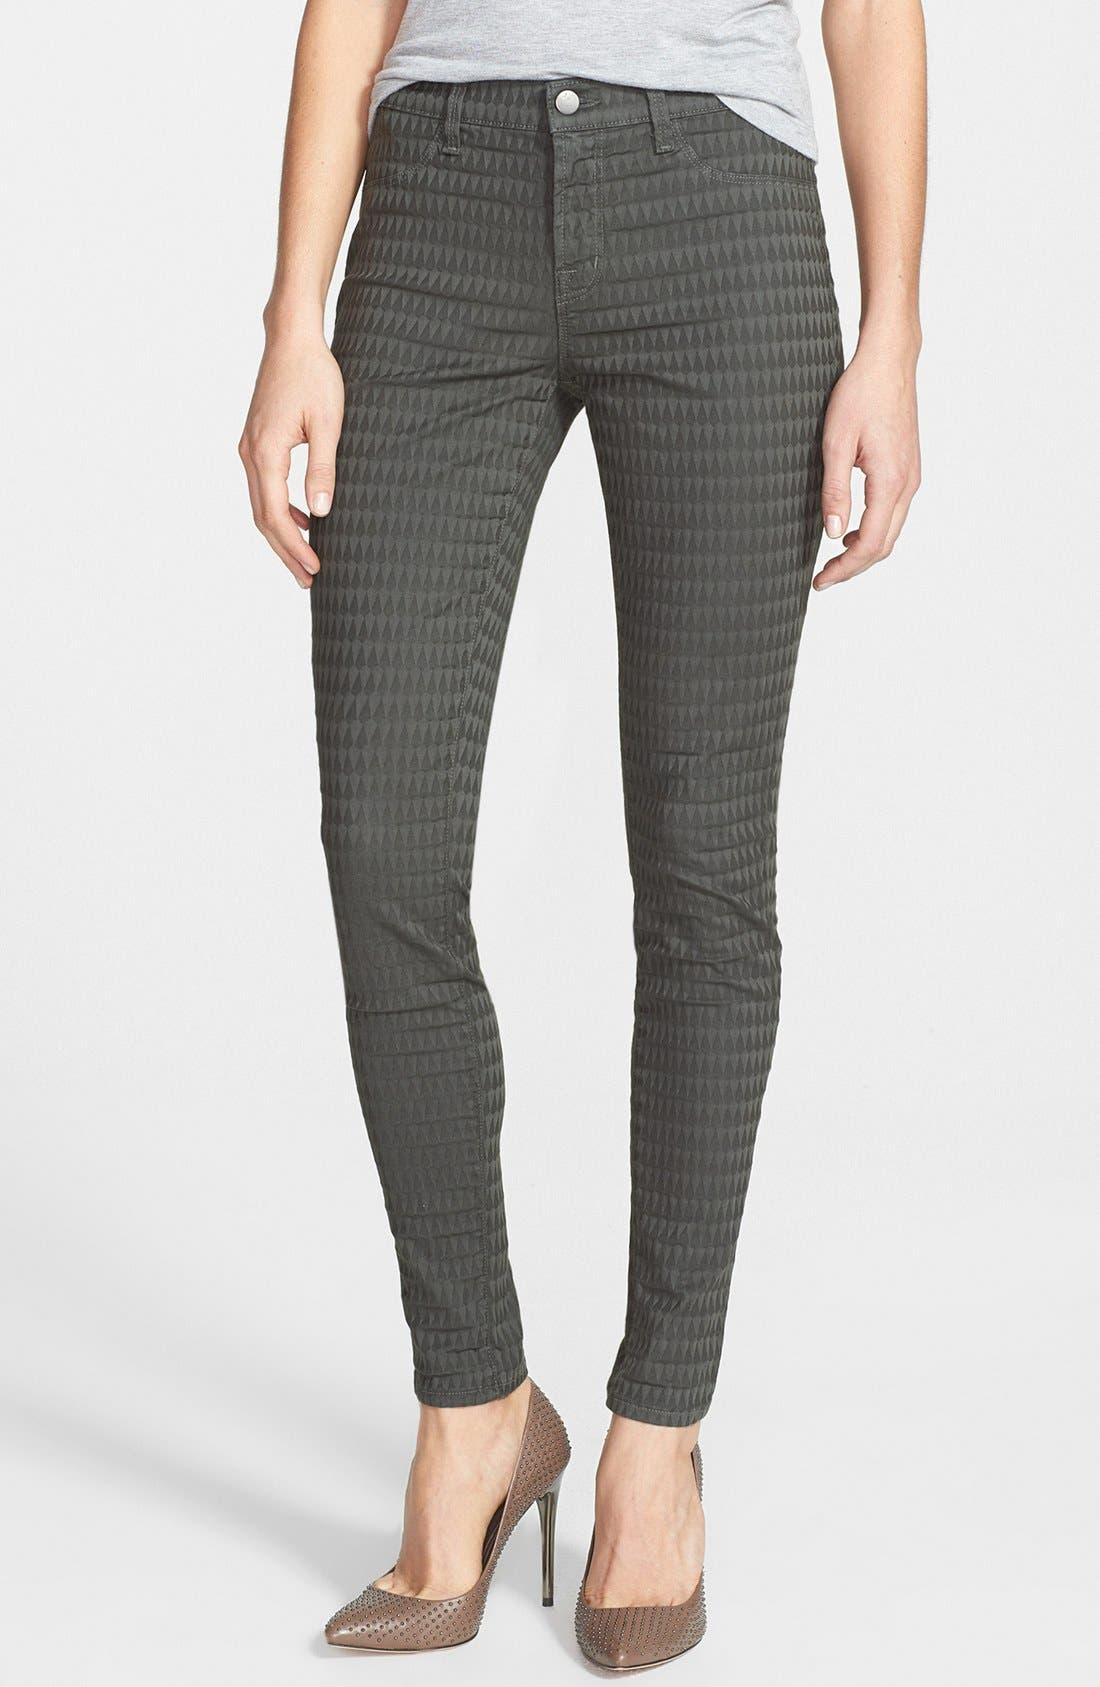 Alternate Image 1 Selected - J Brand Jacquard Skinny Jeans (Mica)